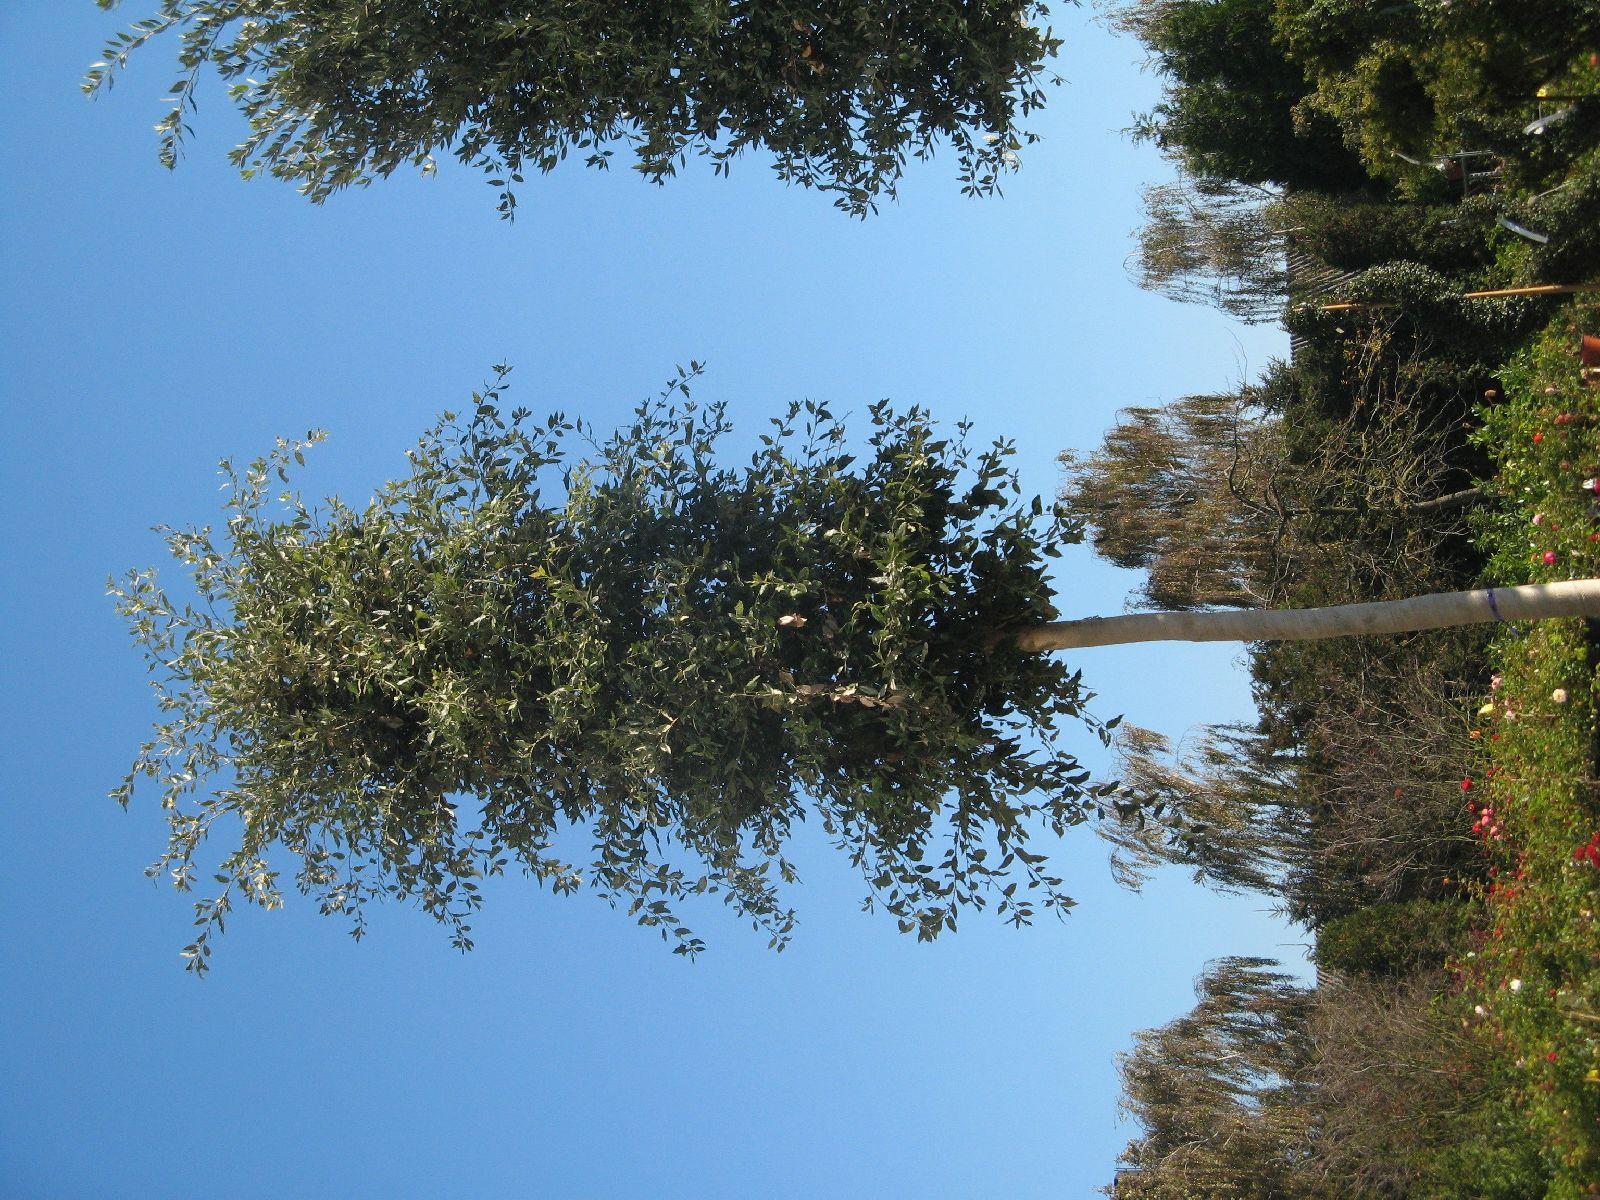 Plants-Trees_Photo_Texture_B_3741